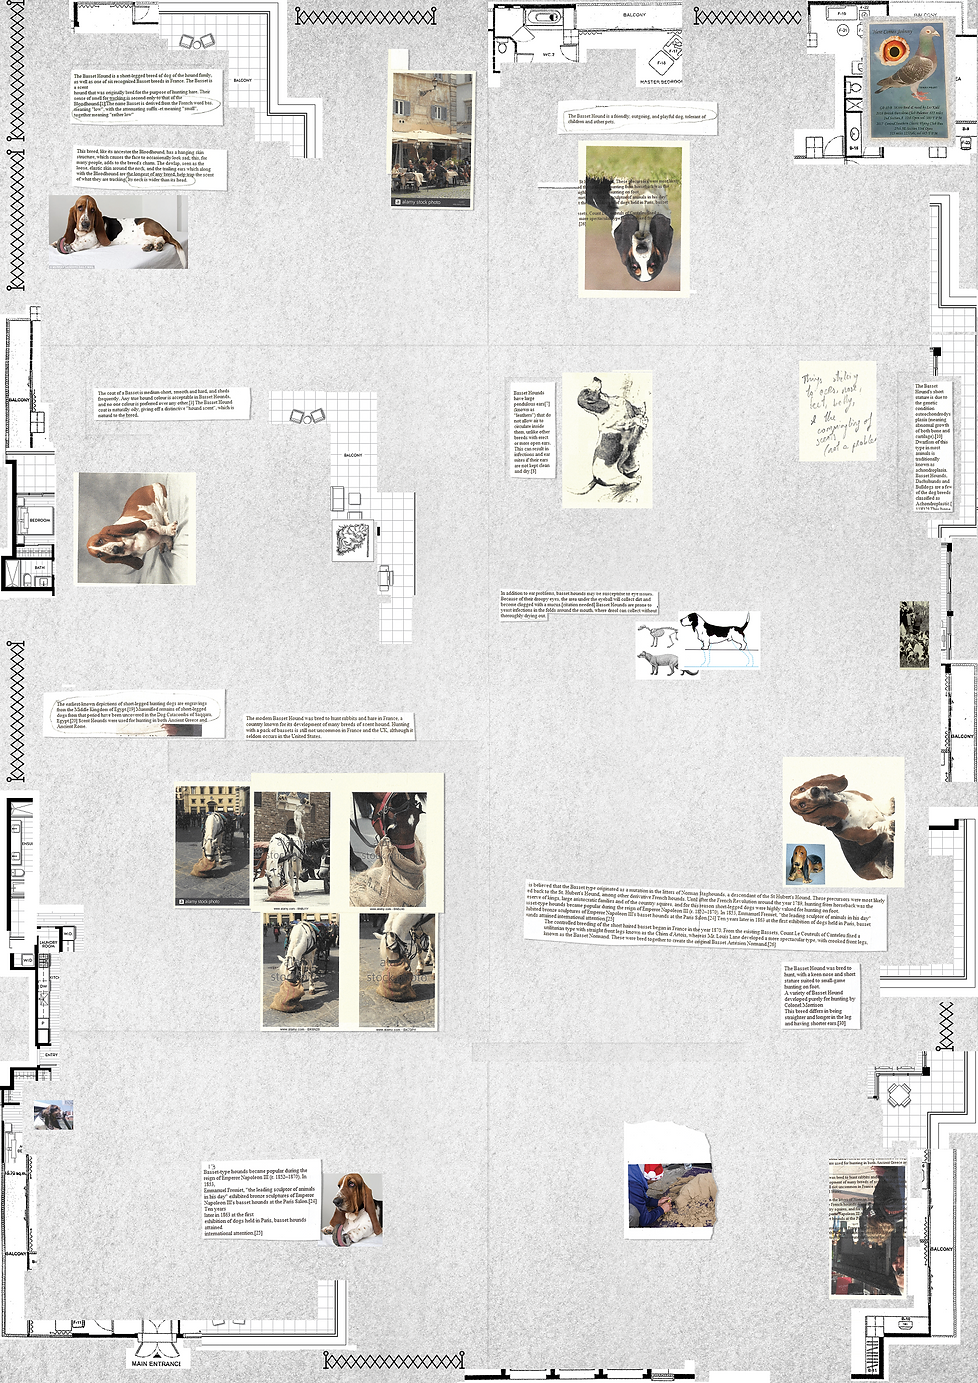 Dog Poster PNG 1613 x 2281 pixels.png